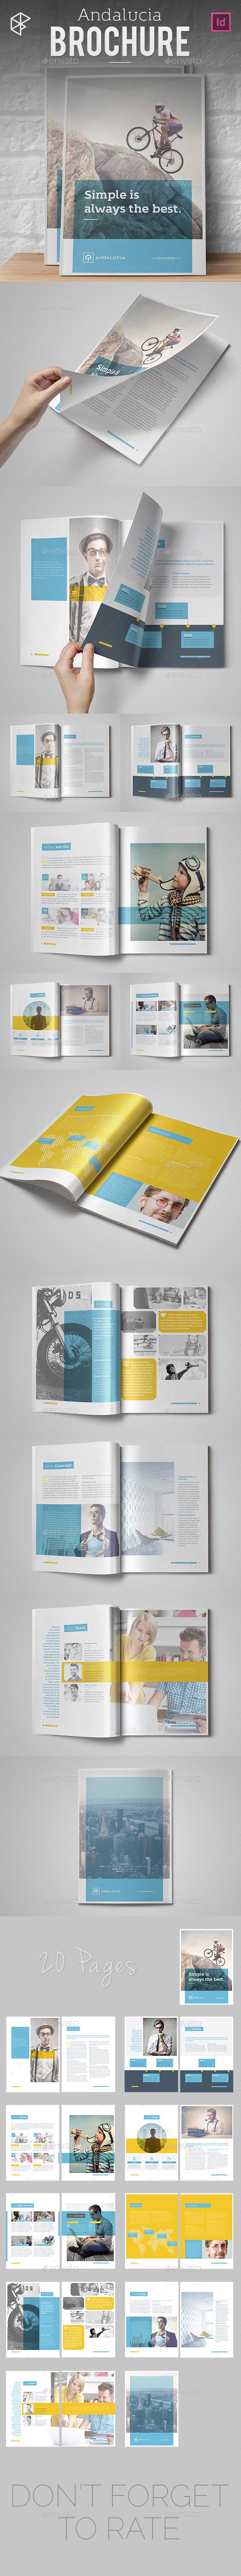 Andalucia Brochure - Informational Brochures